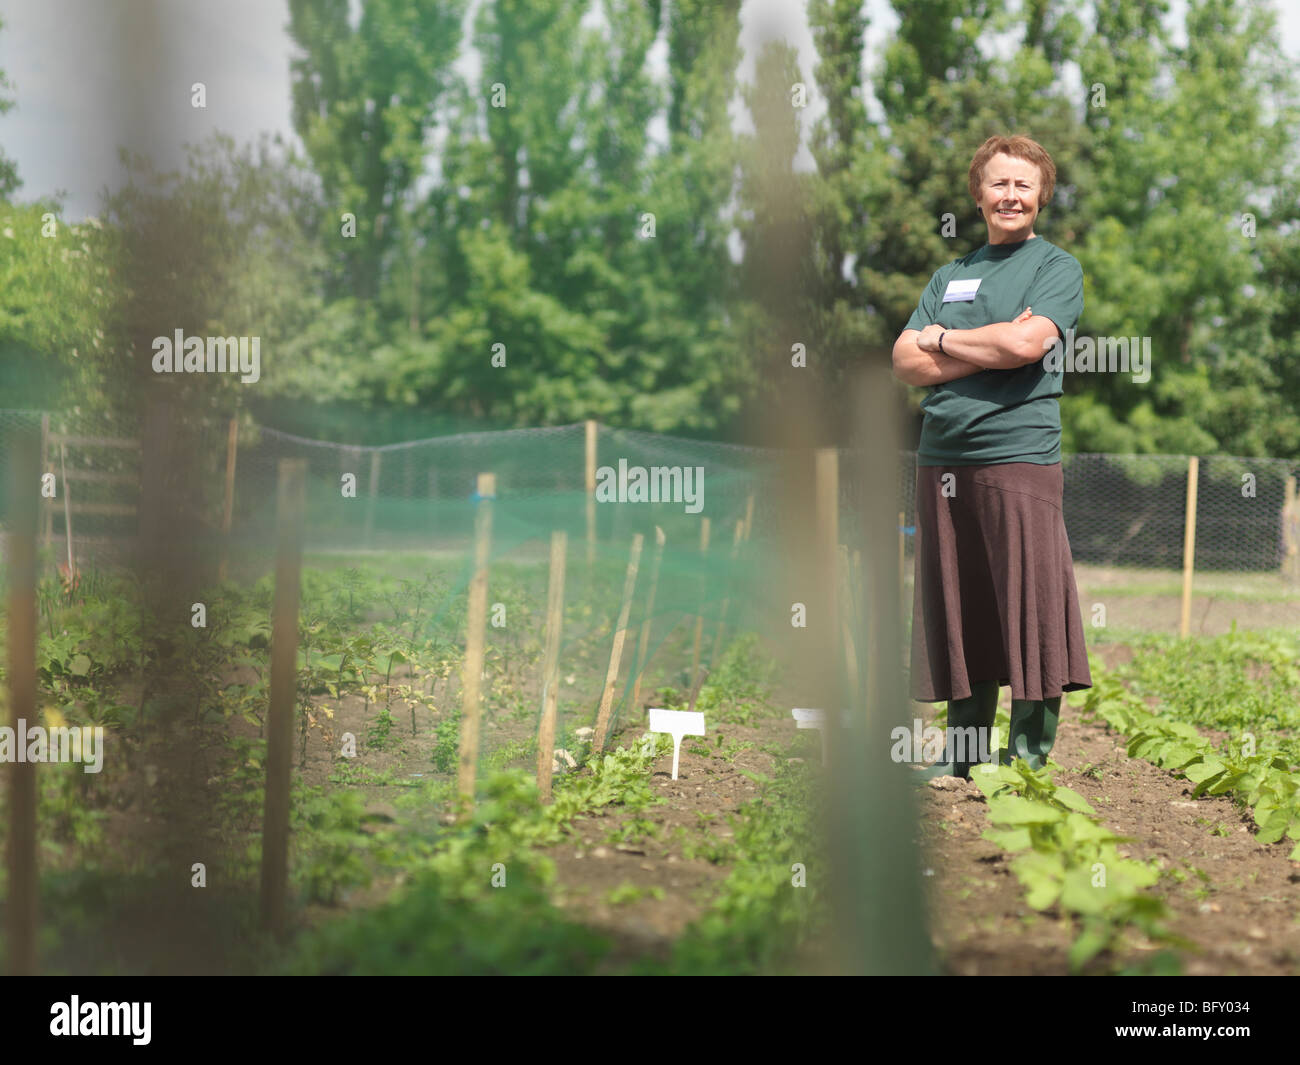 Female Garden Worker In Rows Of Plants - Stock Image